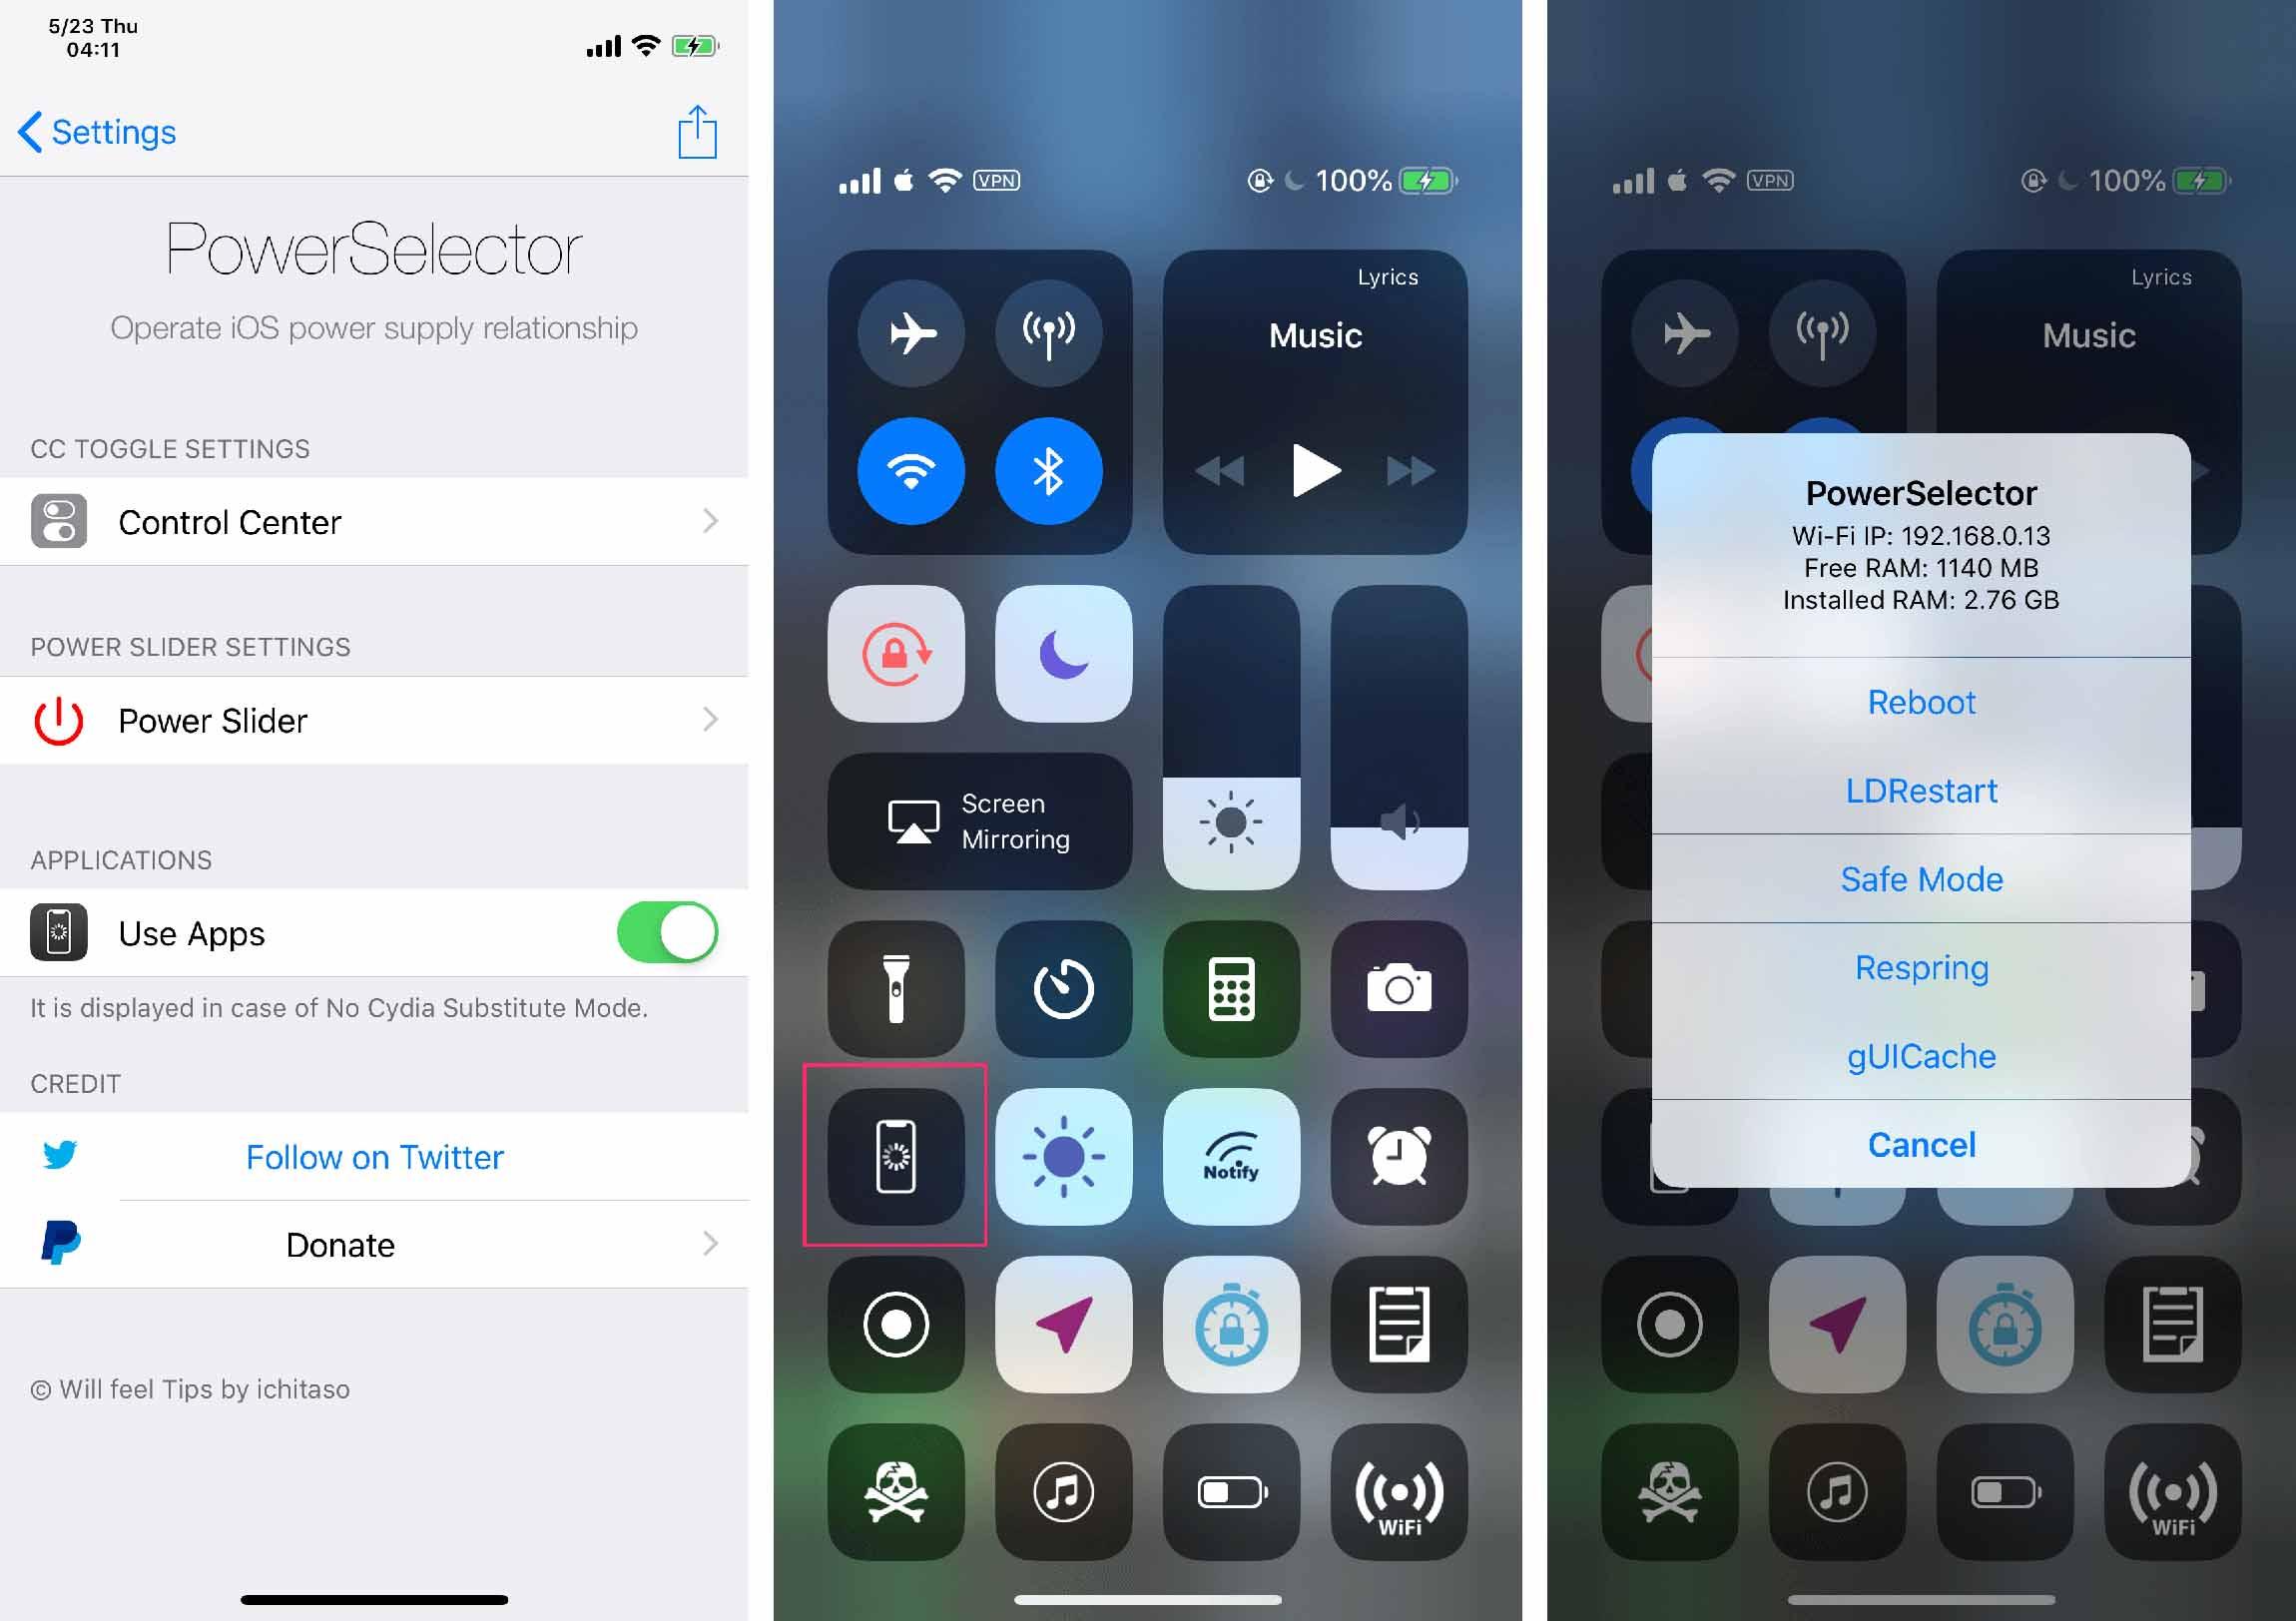 How to LDRestart jailbroken iPhone - PowerSelector